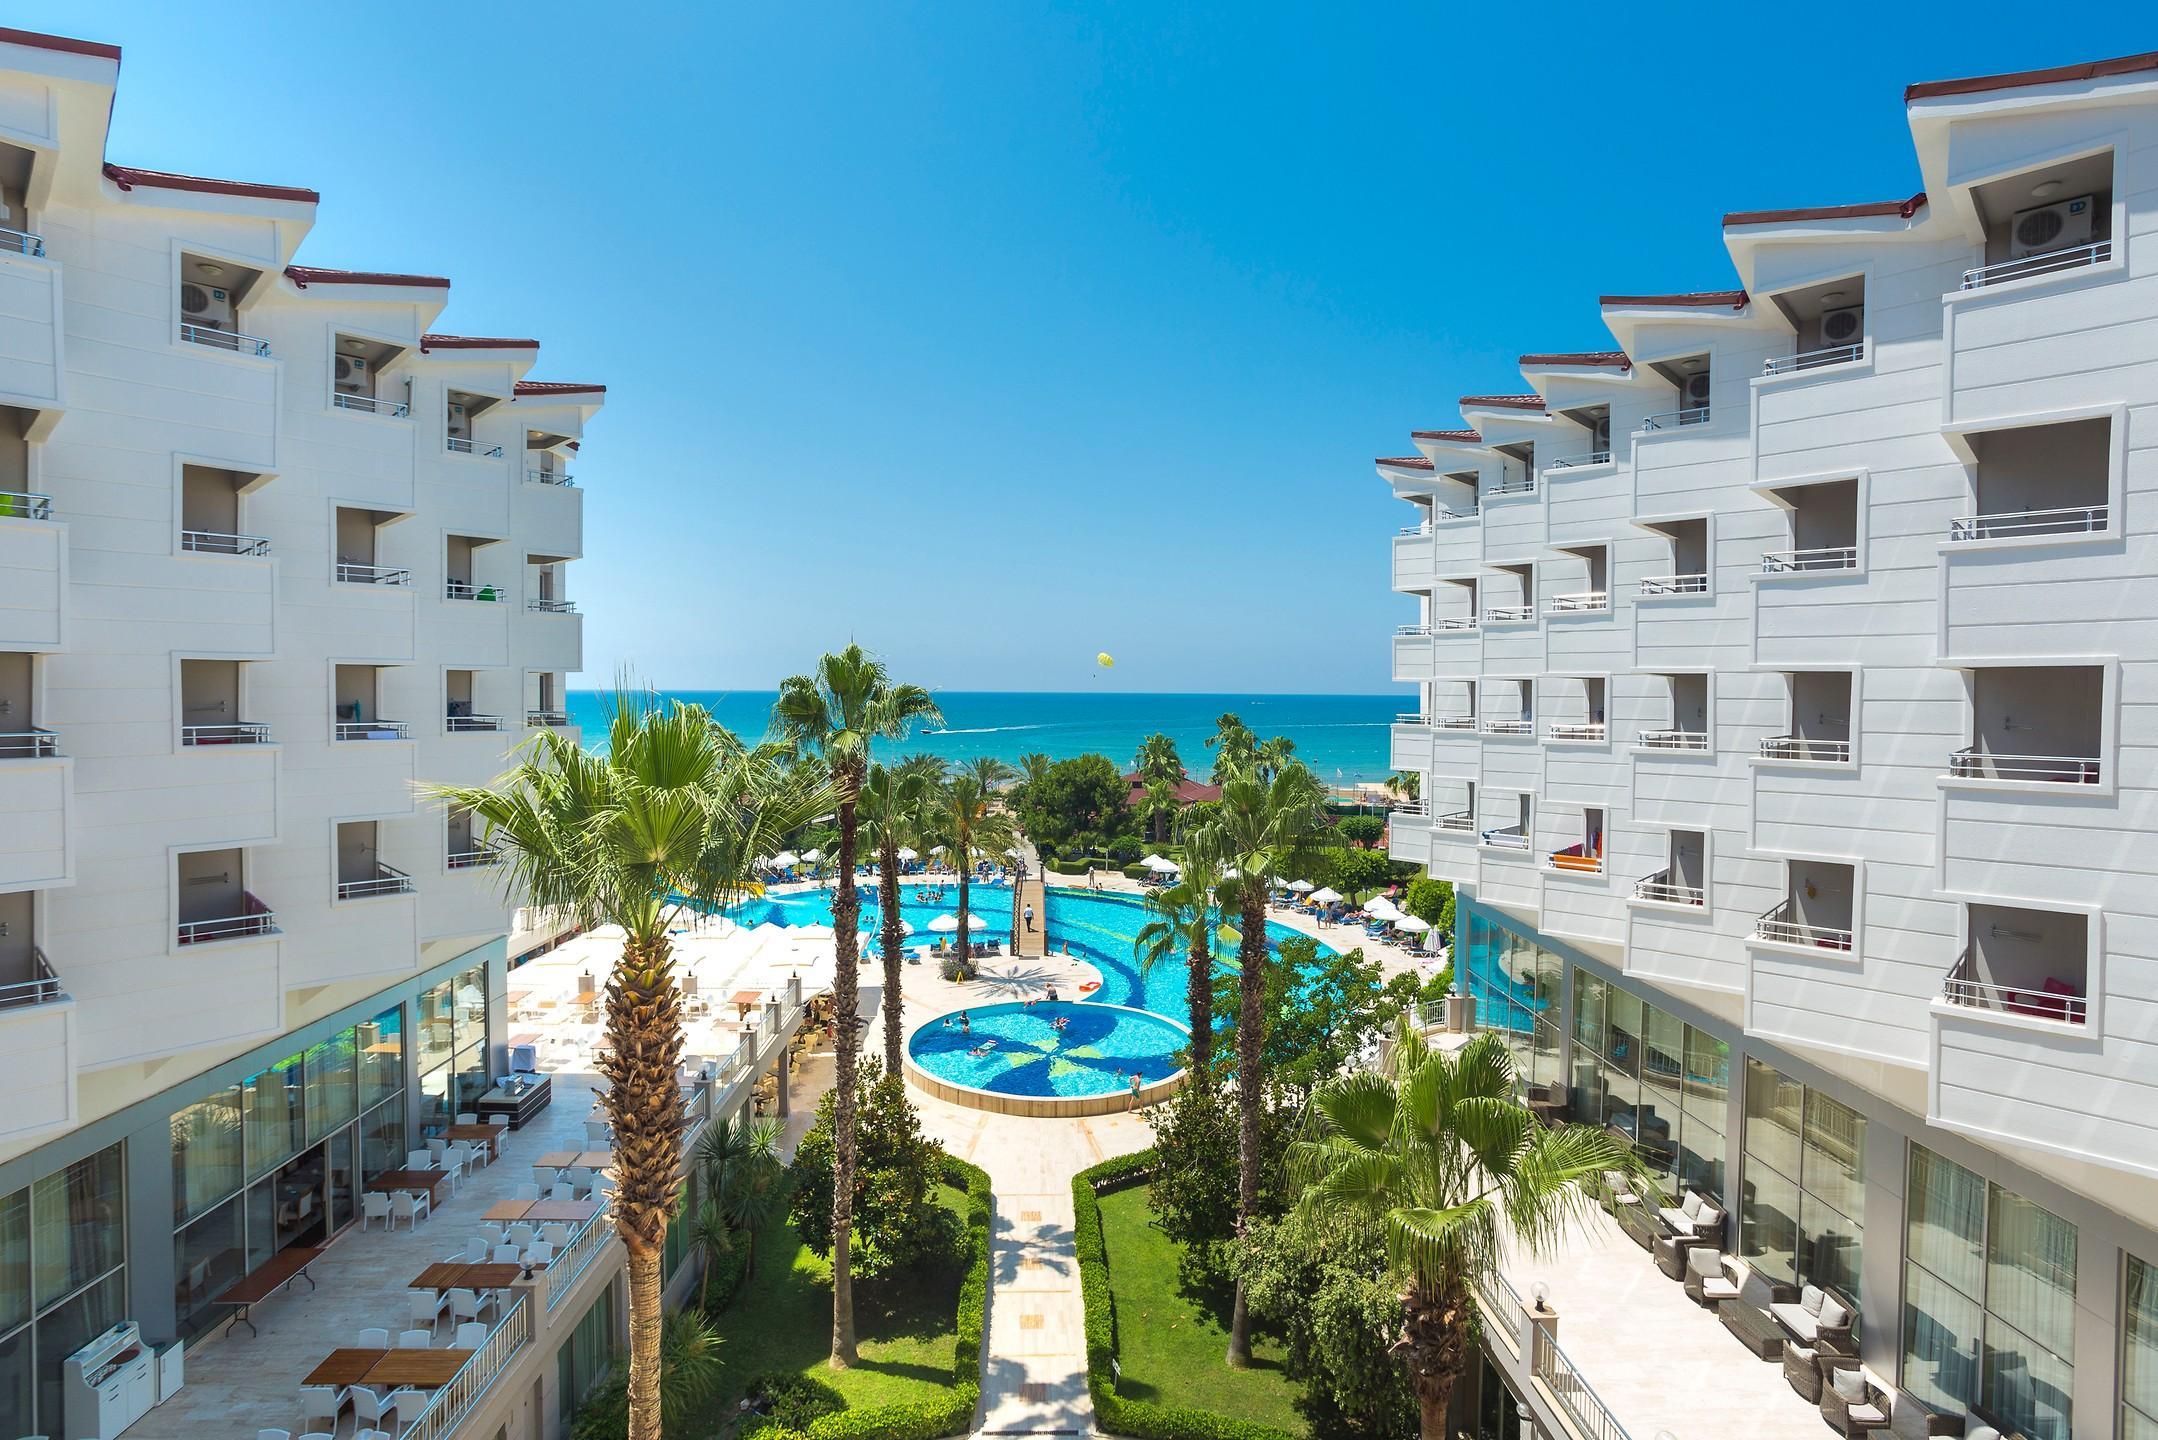 Отели Турции 5 звезд все включено: обзор